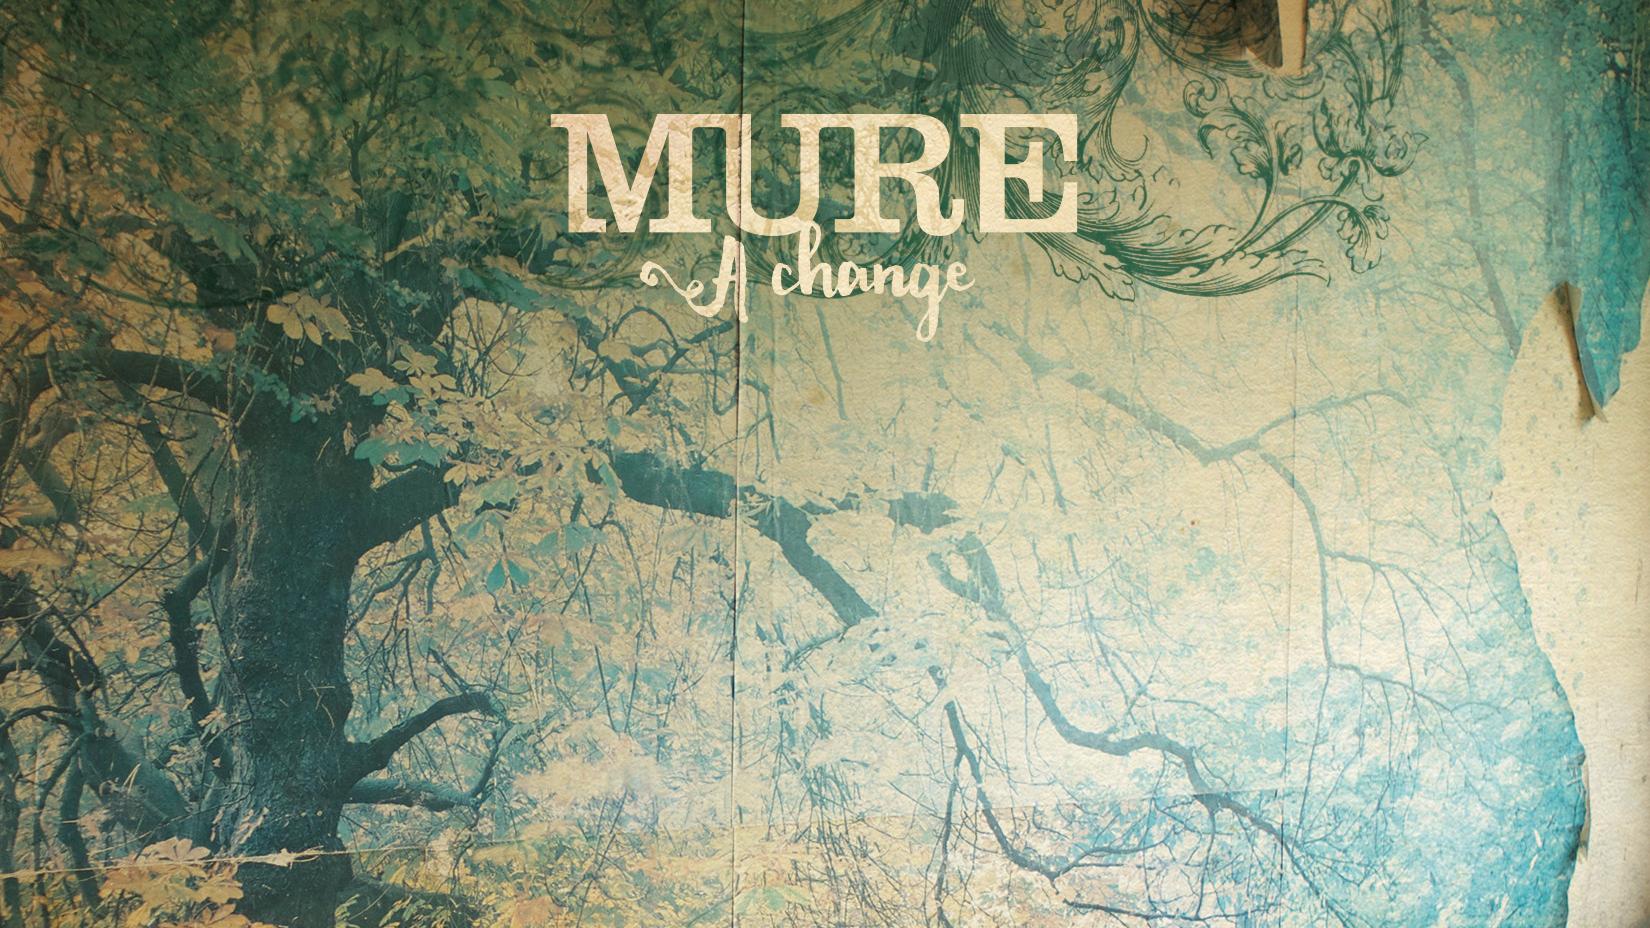 MURE-a_change-couv_digipack-1516734556.jpg